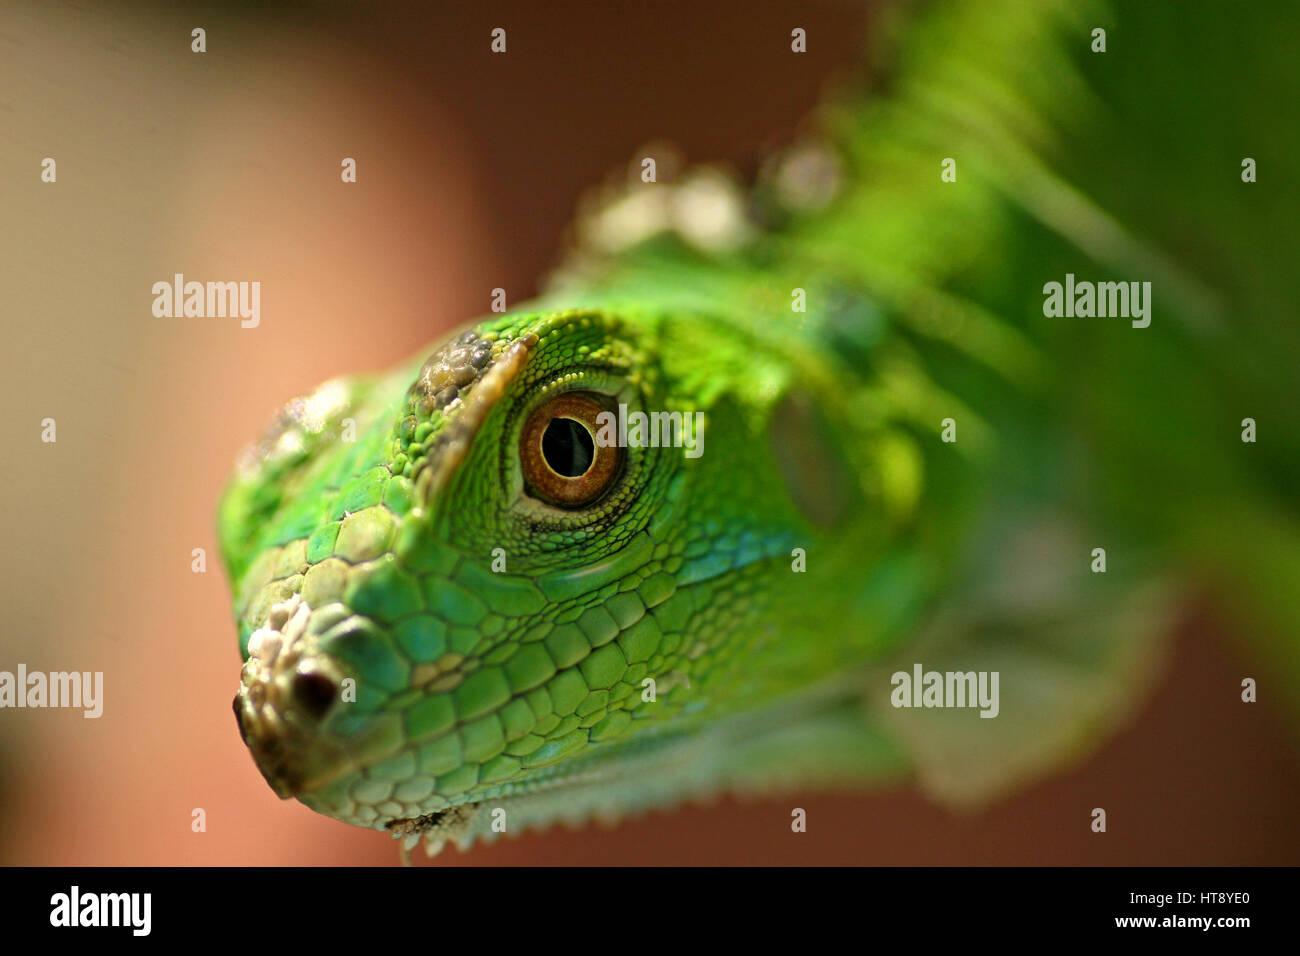 Green Iguana / San Ignacio, Belize - Stock Image